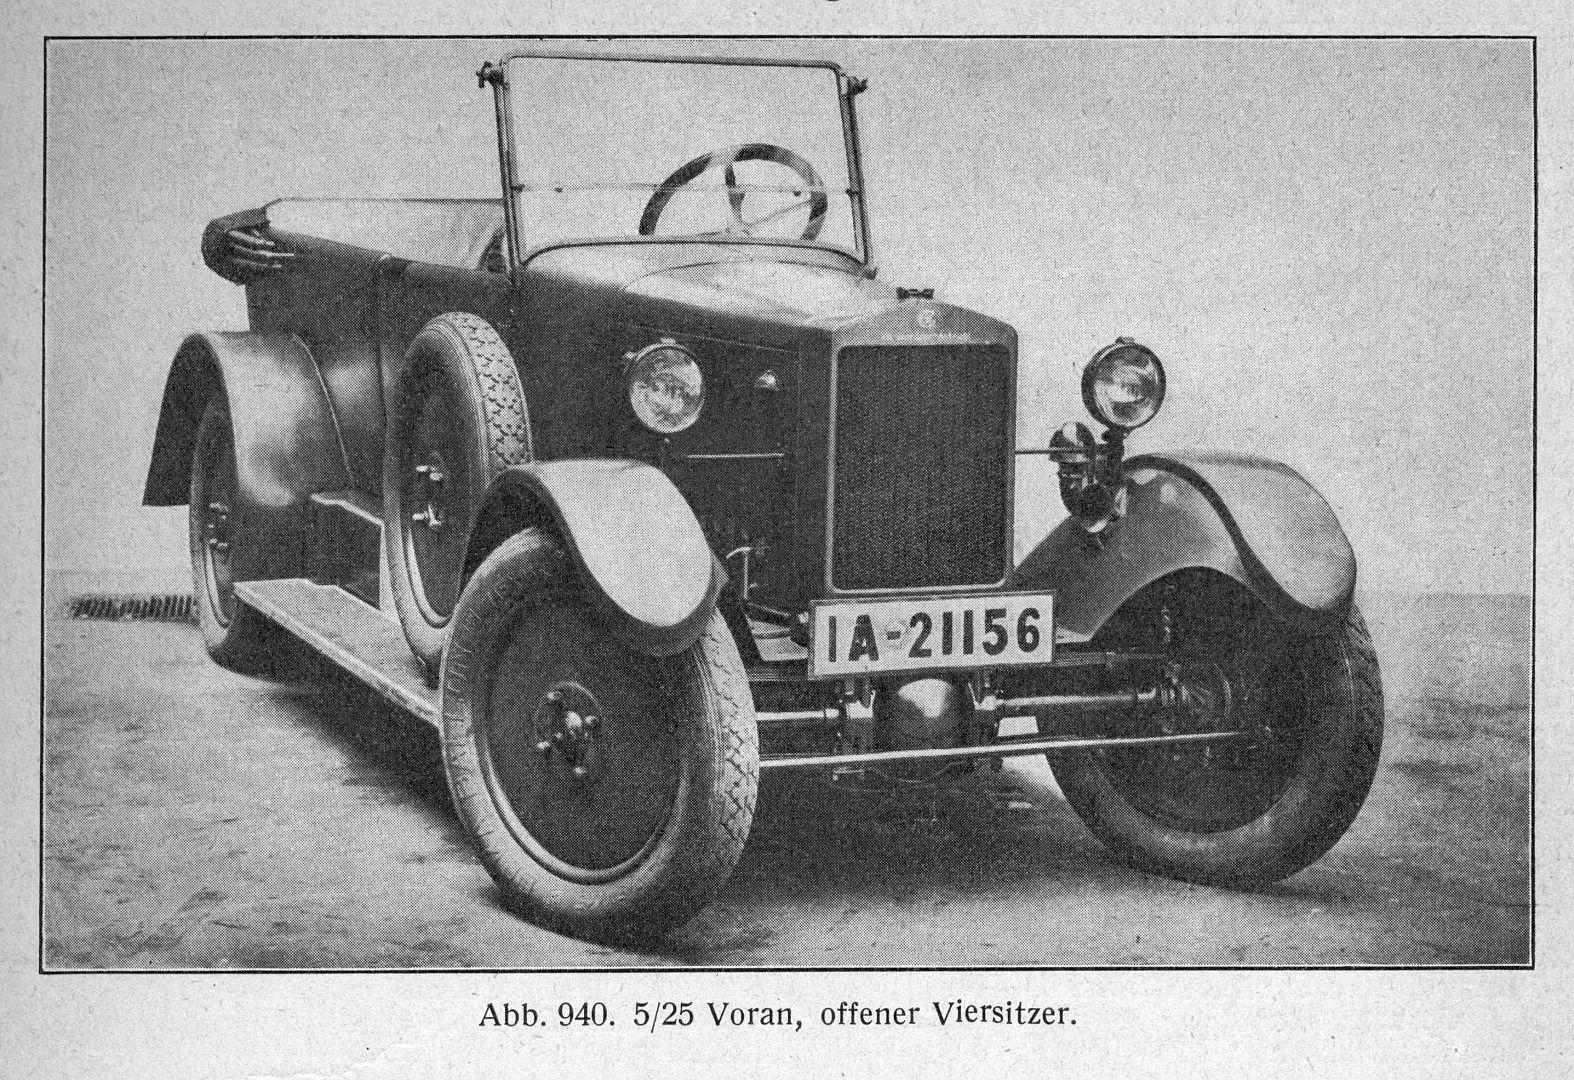 Voran_5-25_PS_Galerie_Motorfahrzeuge_1928